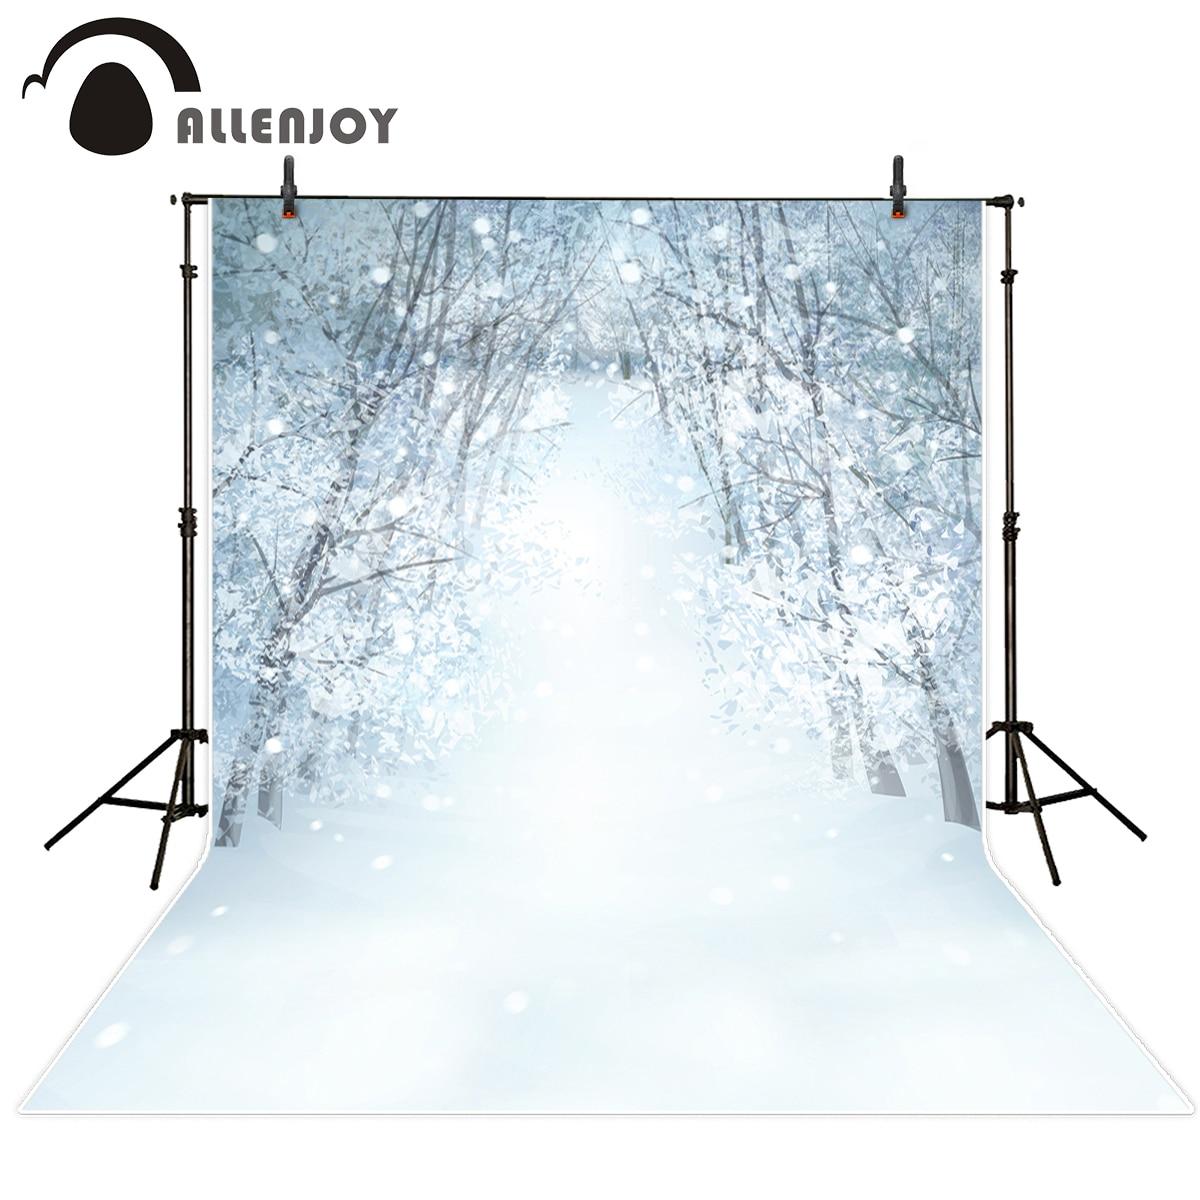 Allenjoy photography background snow forest Bokeh Winter Christmas theme backdrop professional photo background studio